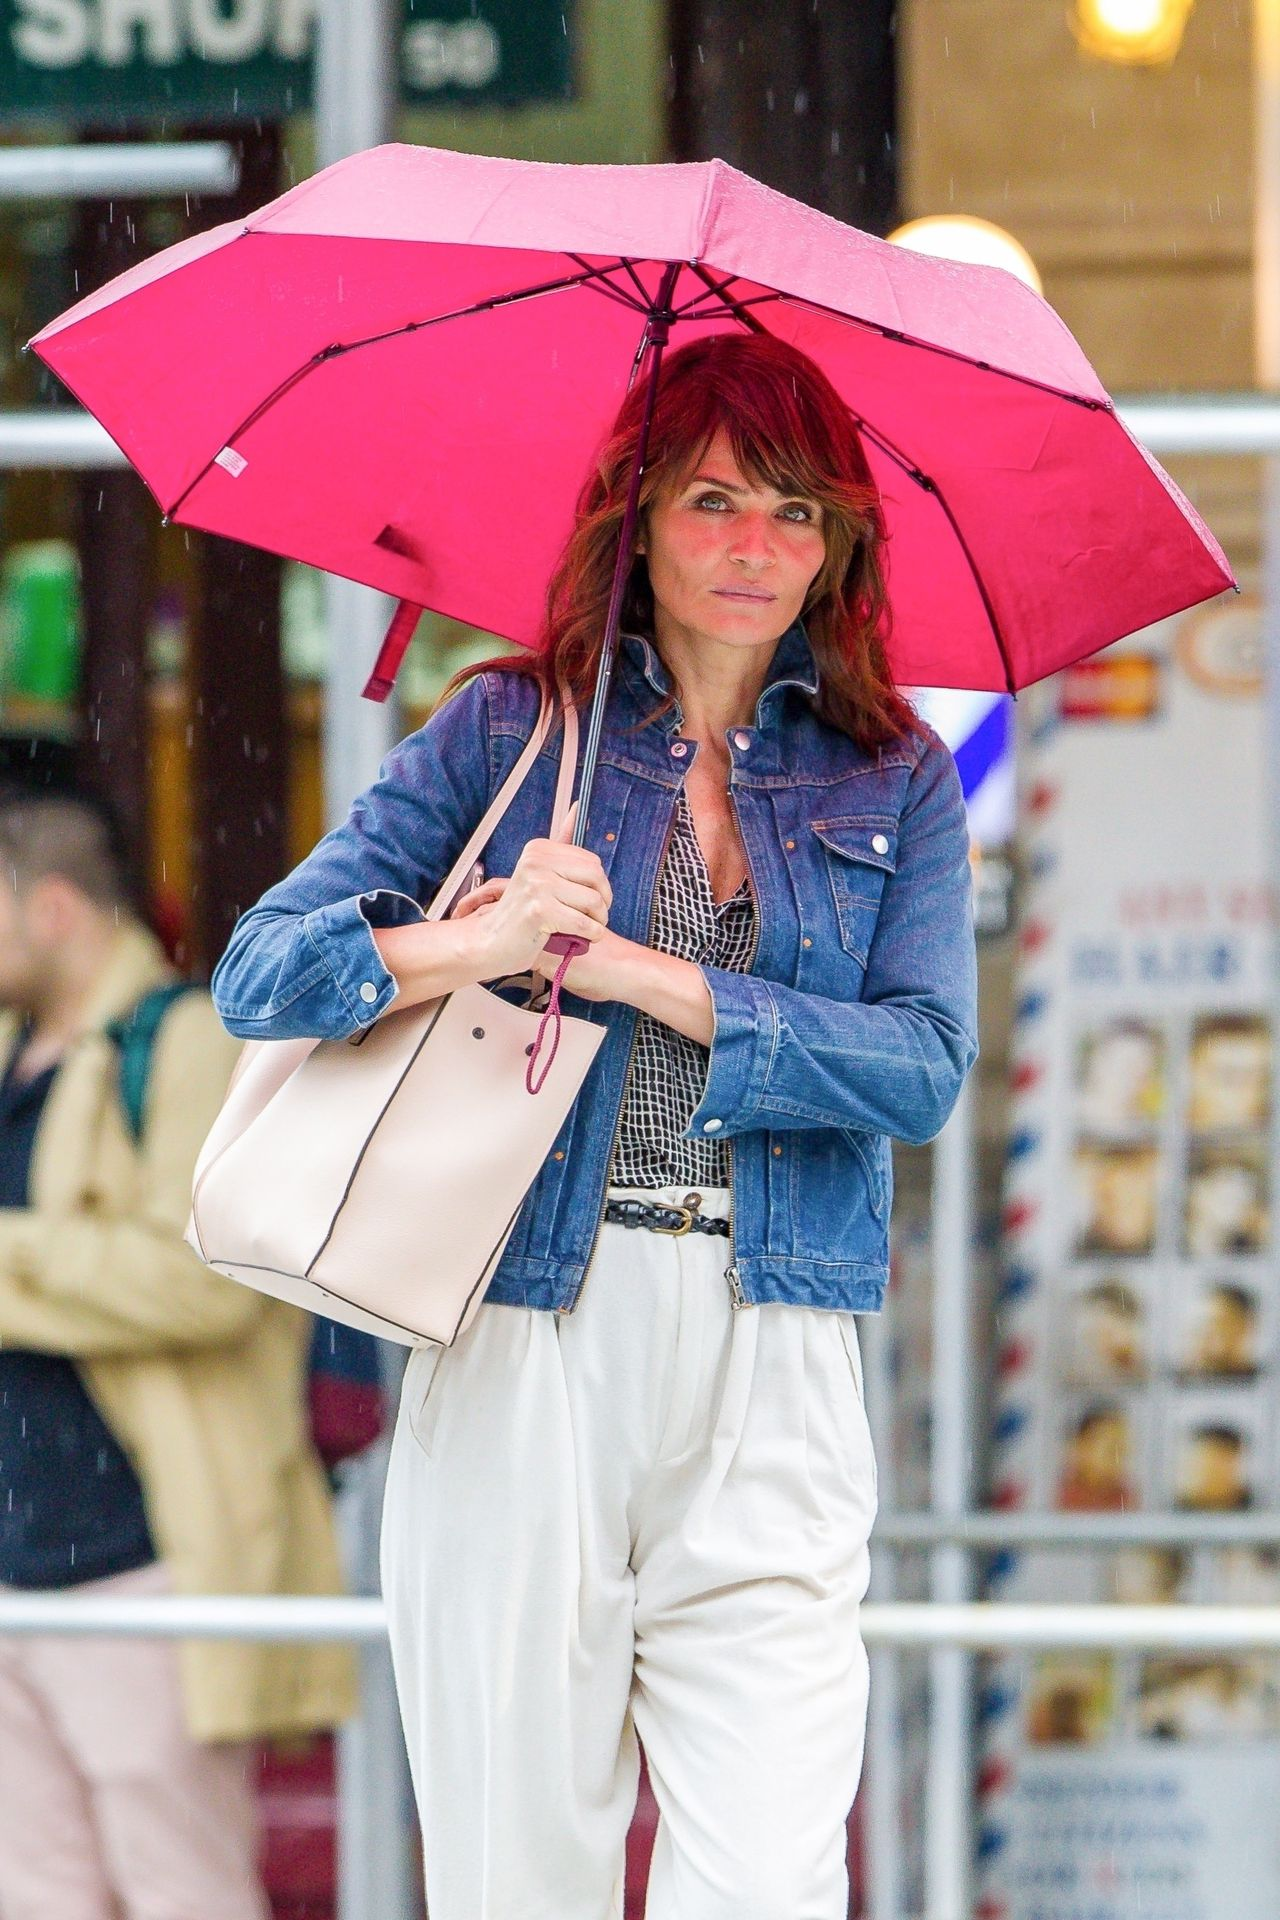 *EXCLUSIVE* Helena Christensen sports a bright pink umbrella on a rainy New York afternoon Helena Christensen